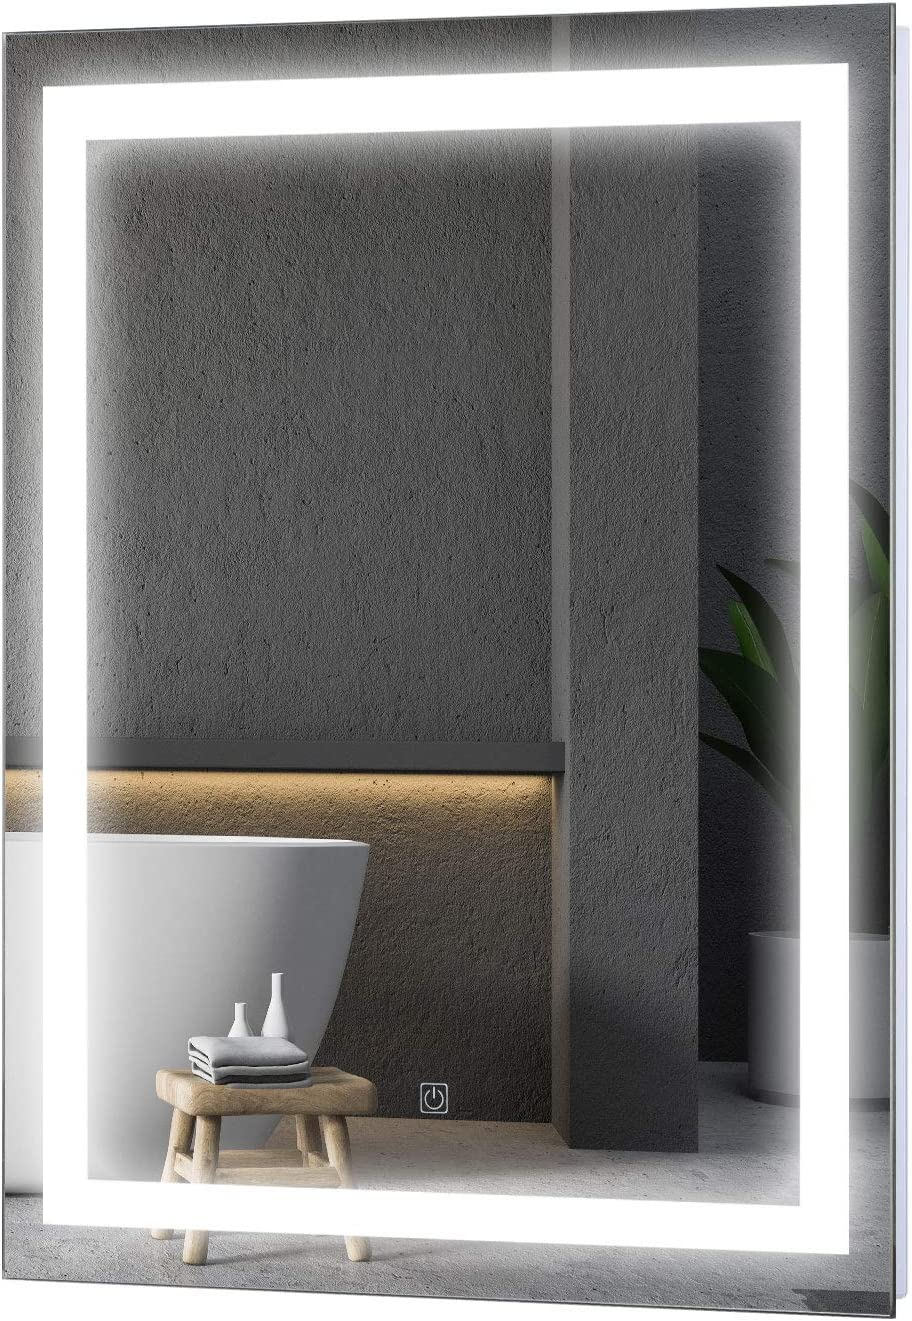 HOMCOM LED Wall Mount Bathroom Vanity Make Up Mirror